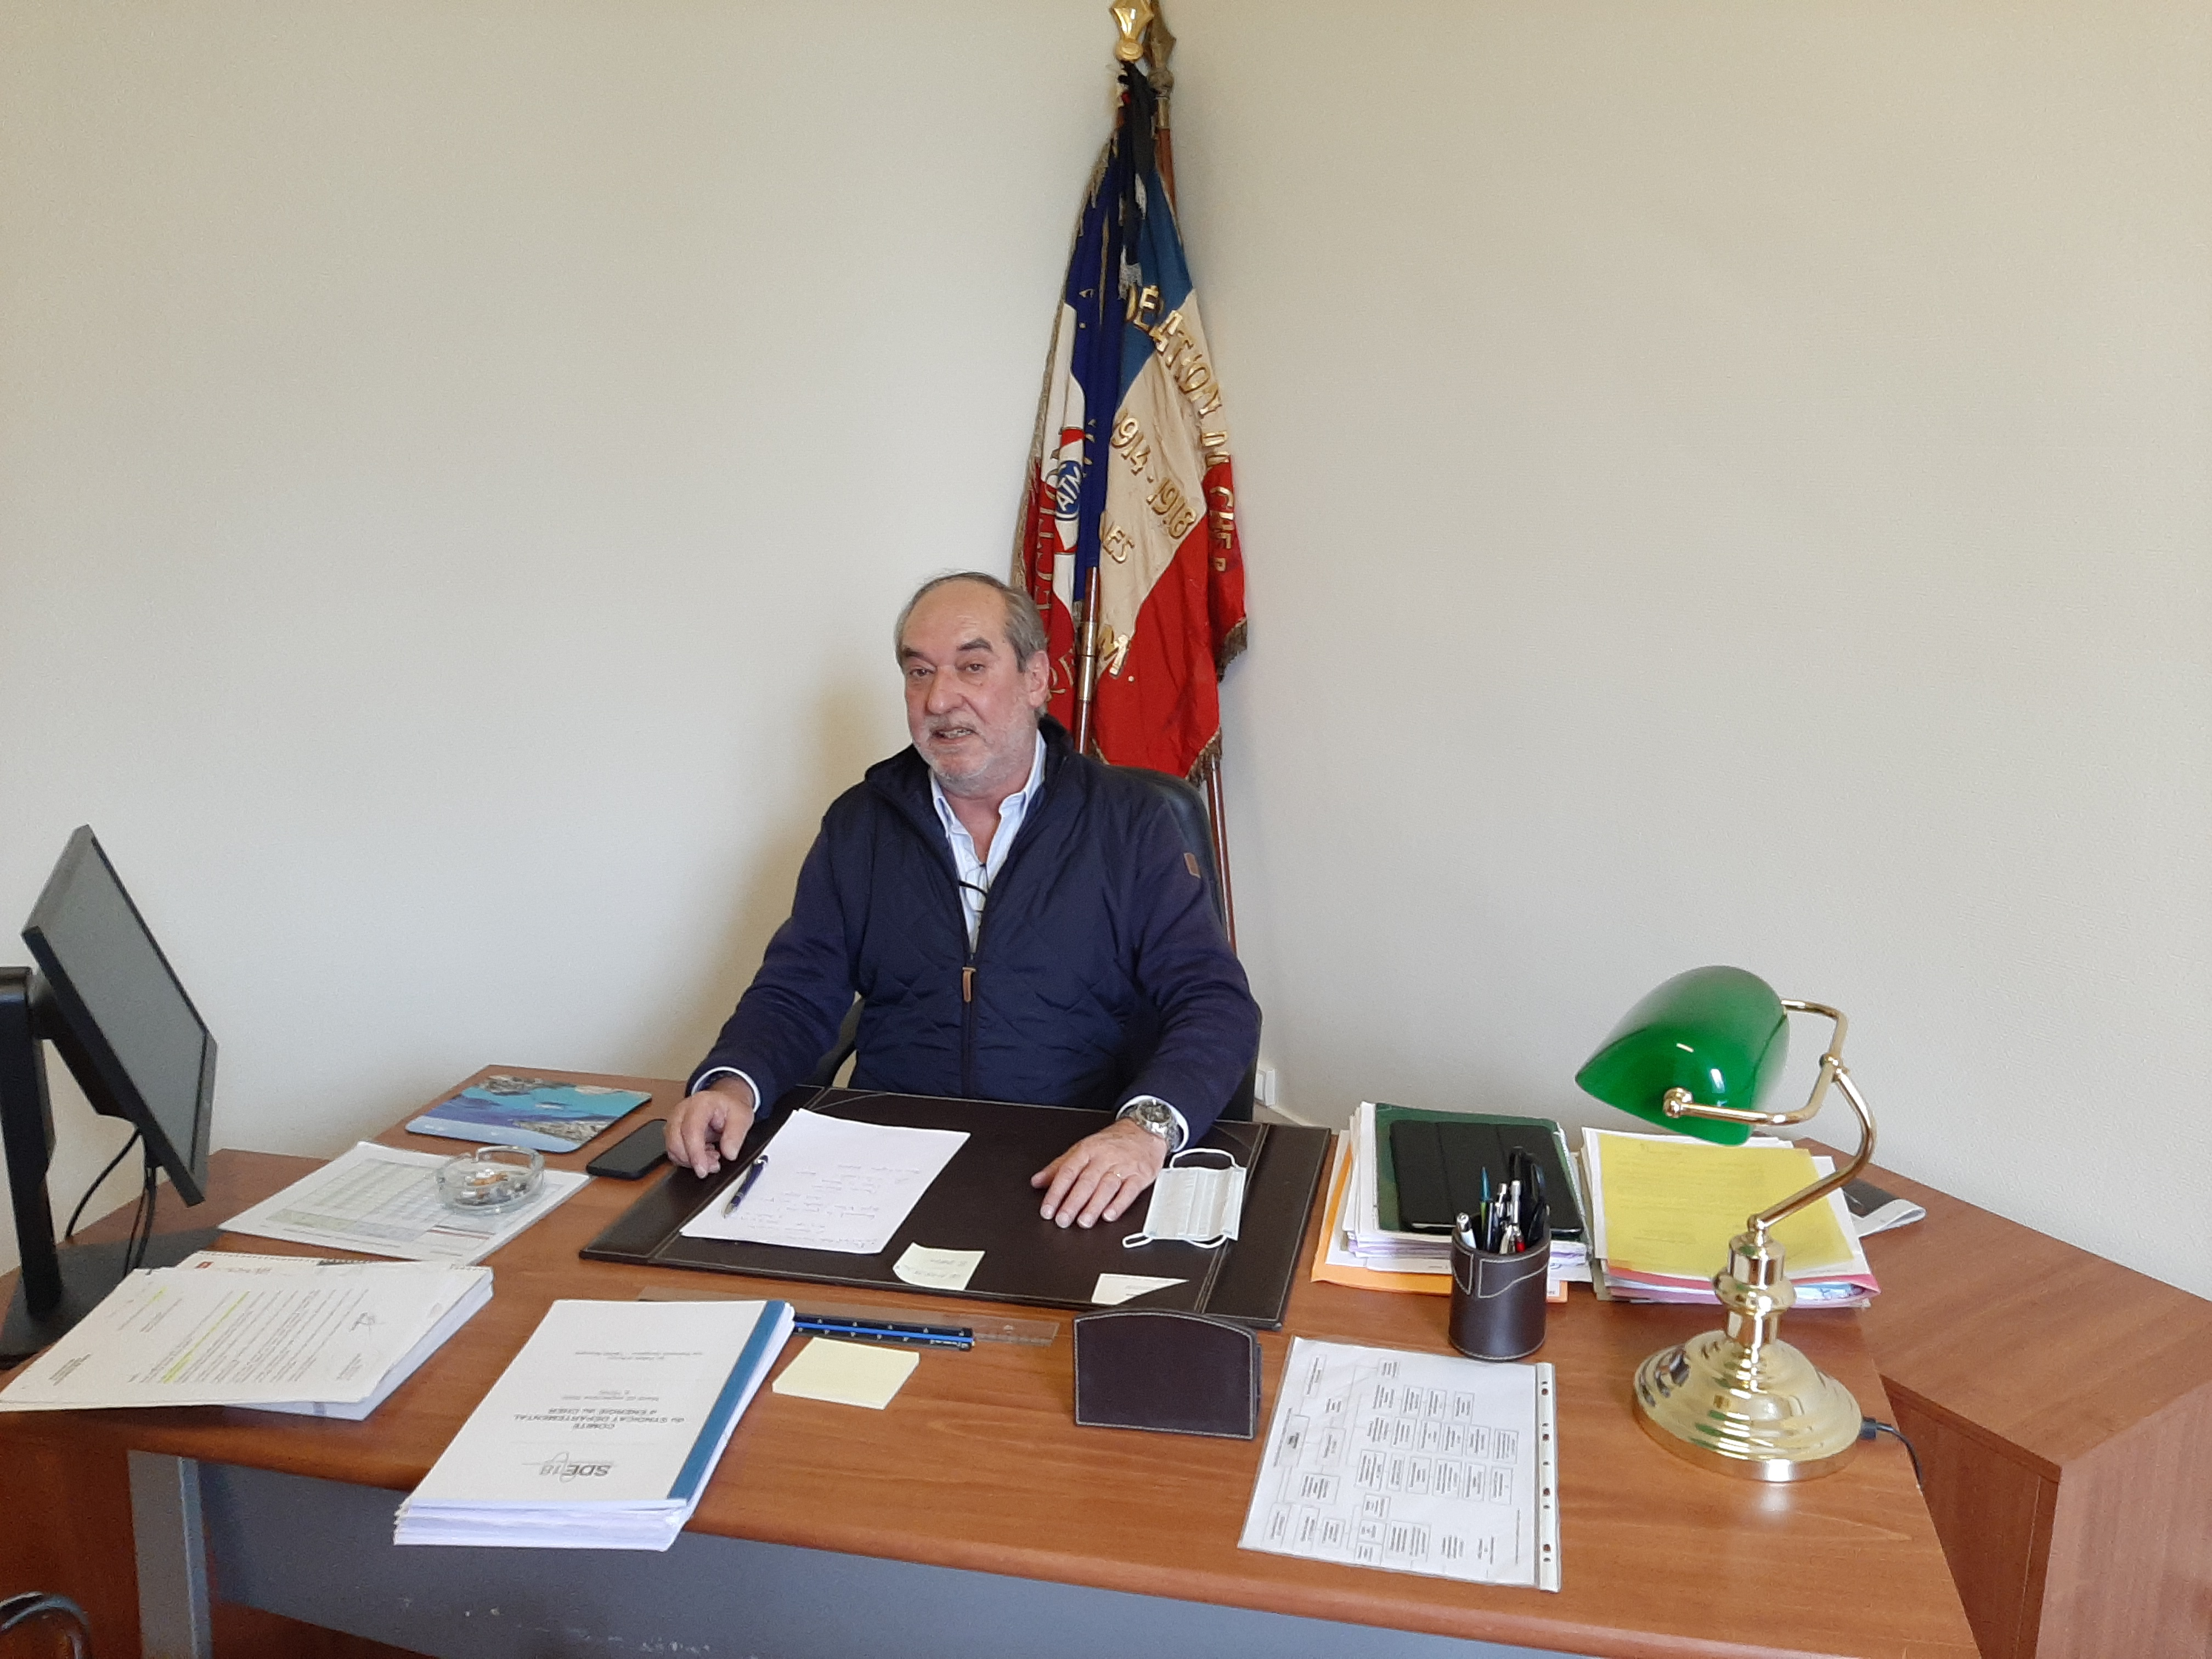 Photo du maire.jpg